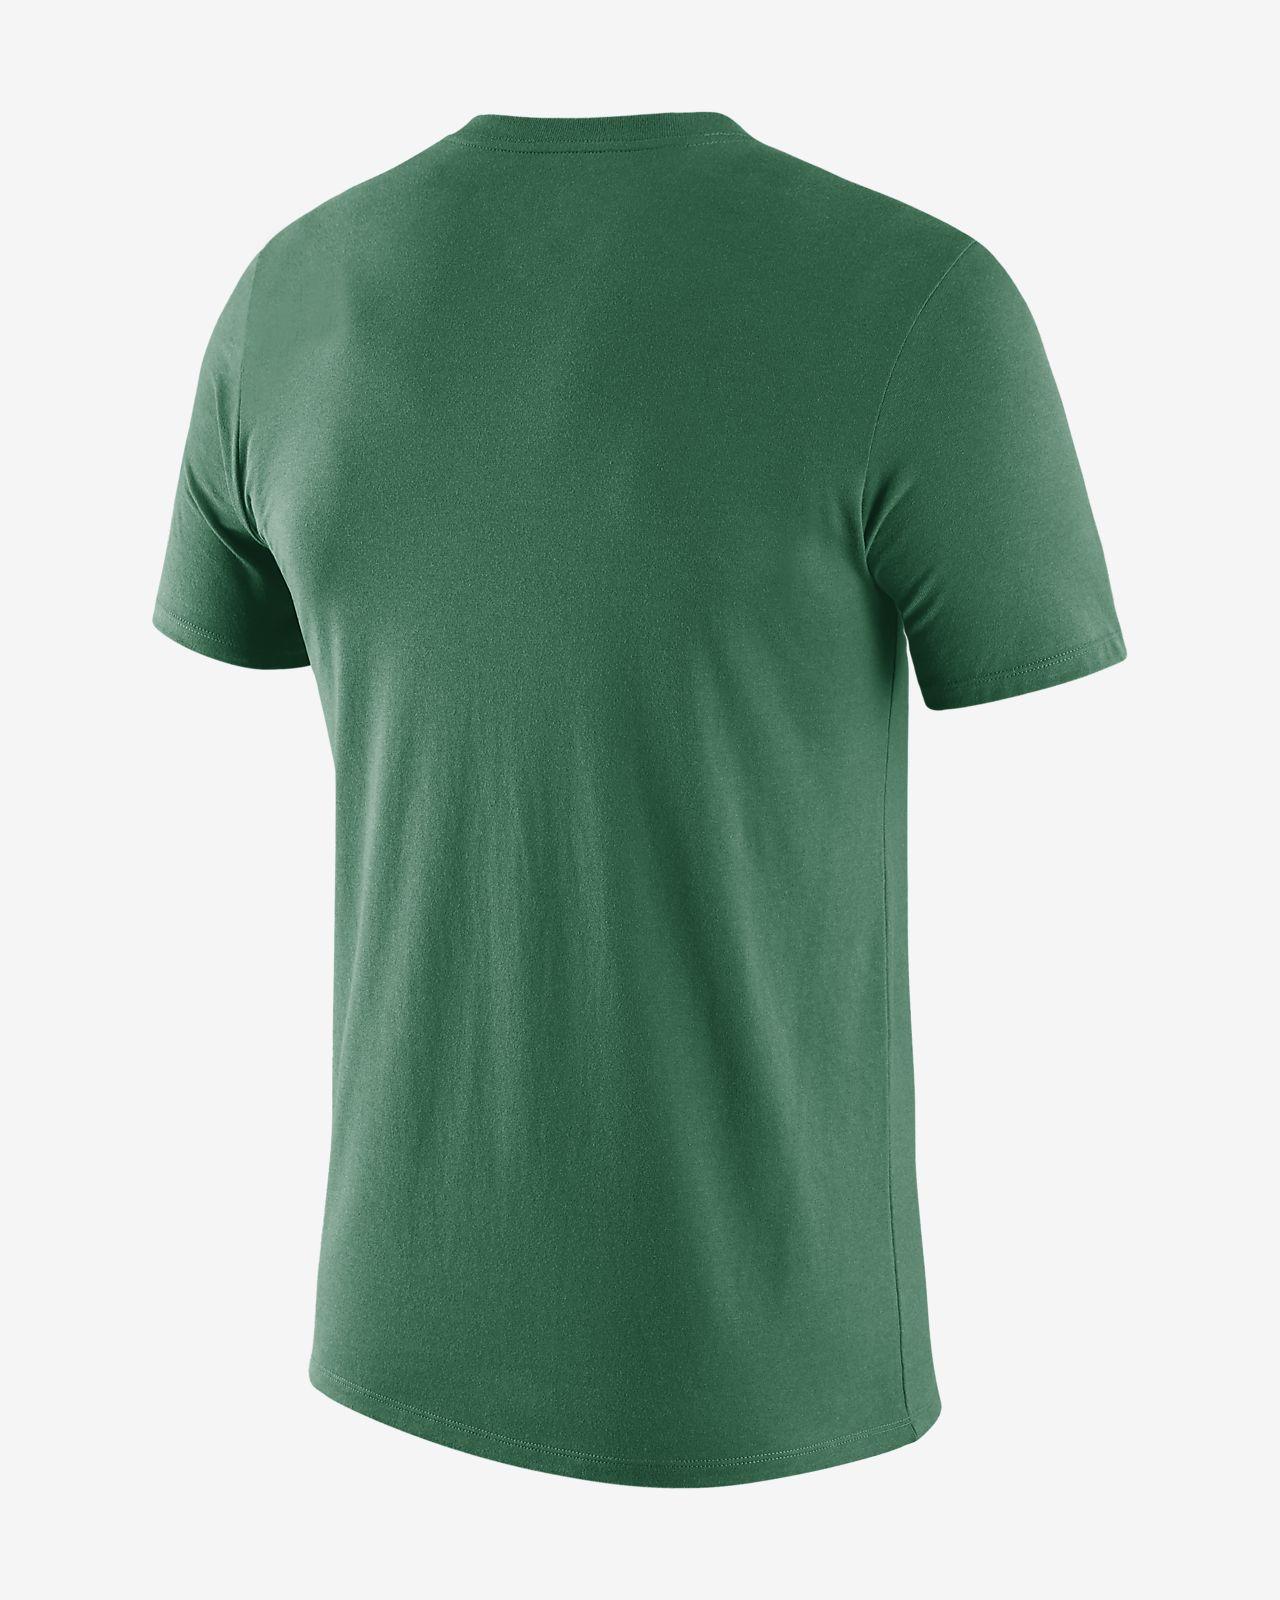 info for da222 2eb2c Boston Celtics Nike Men's NBA T-Shirt